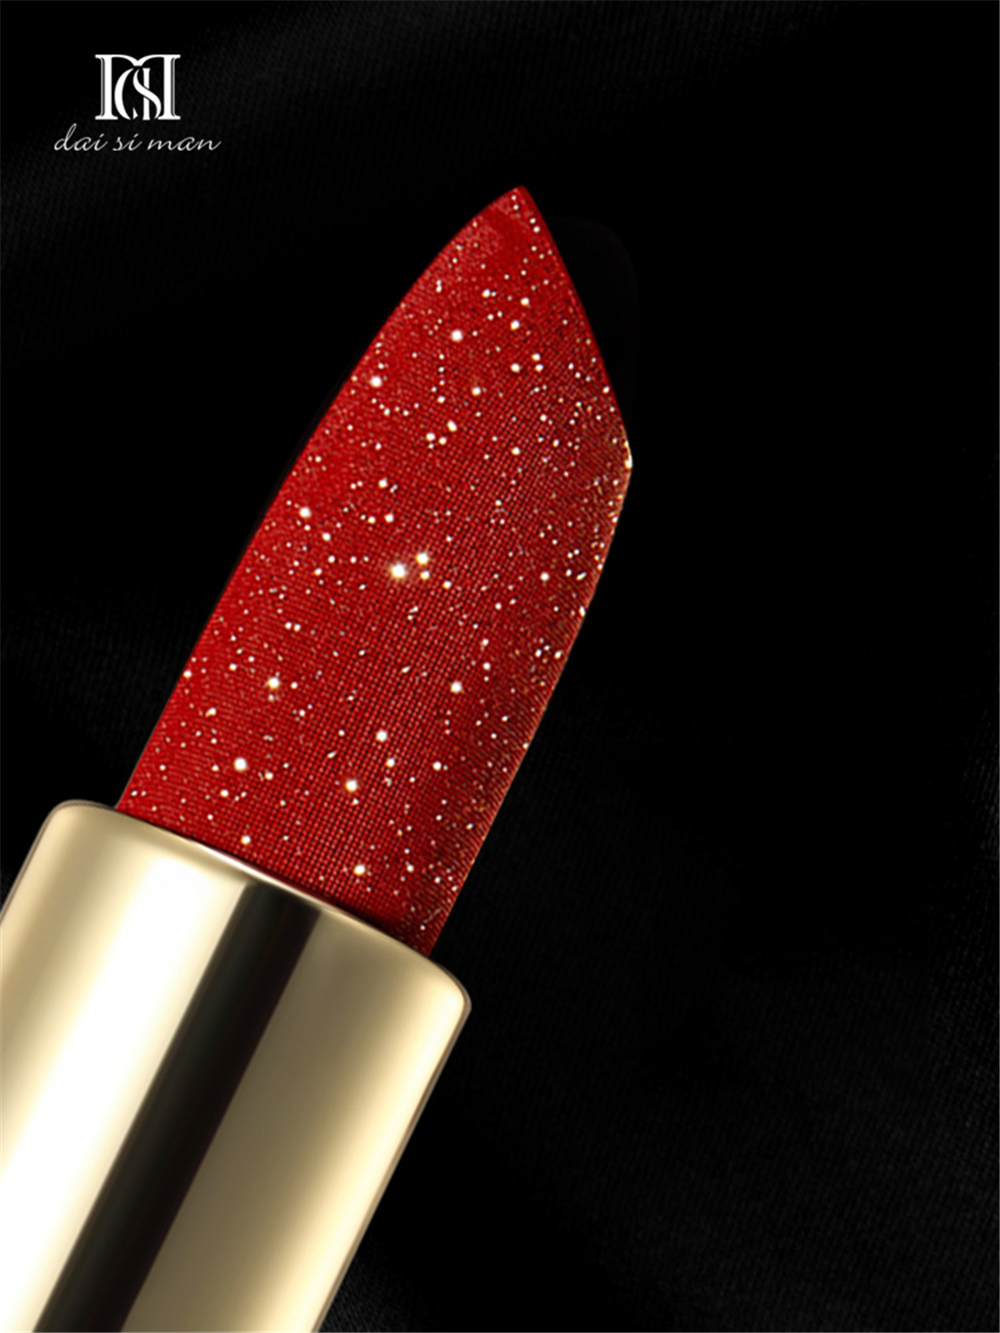 D. S.m diosa Blooming pintalabios hidratante maquillaje pintalabios manchas de labios rojo Sexy cosméticos maquillaje Pintalabios